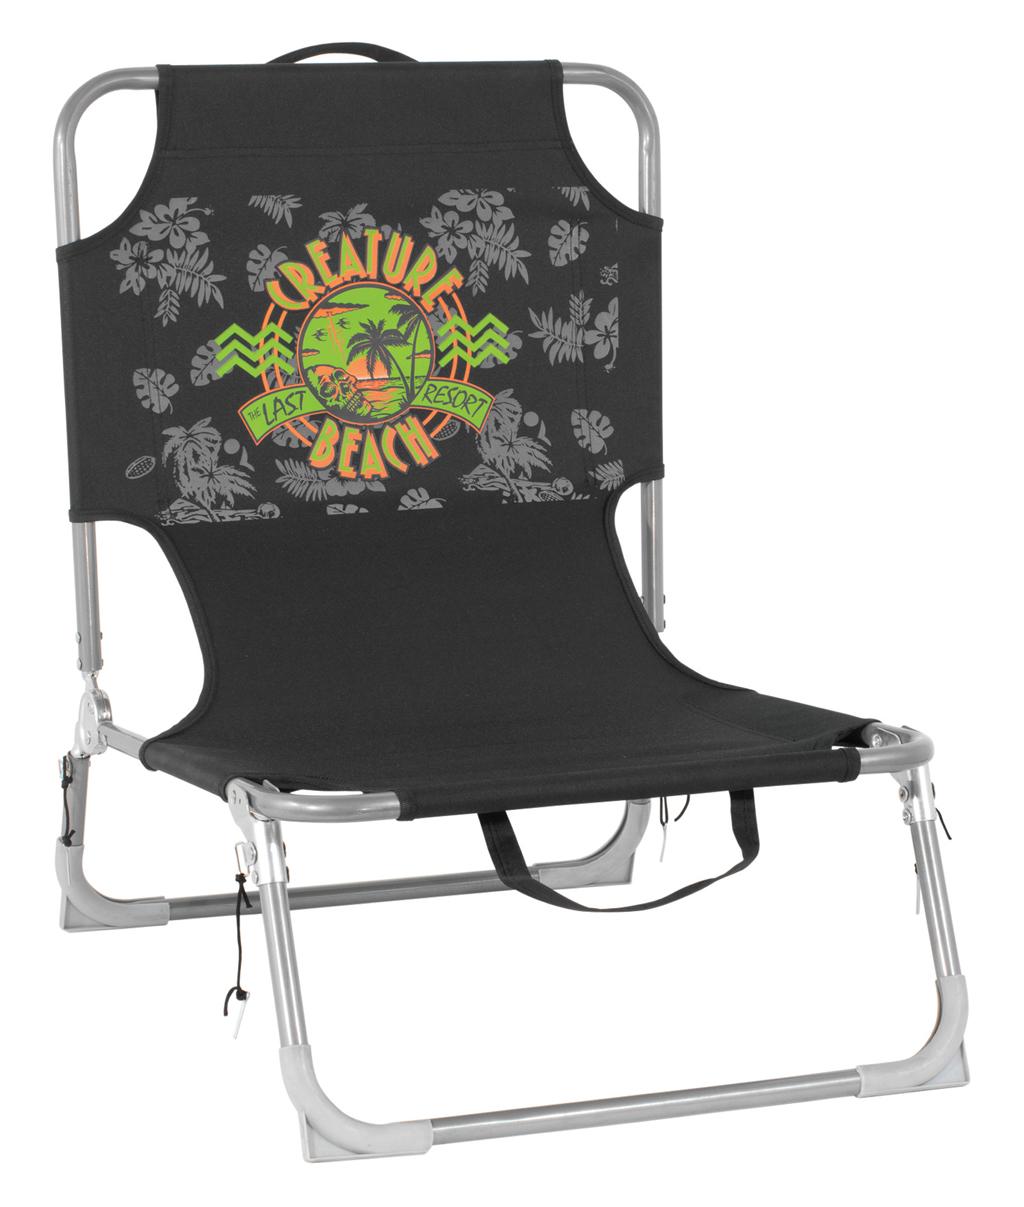 CR_lastresort_foldingchair_front